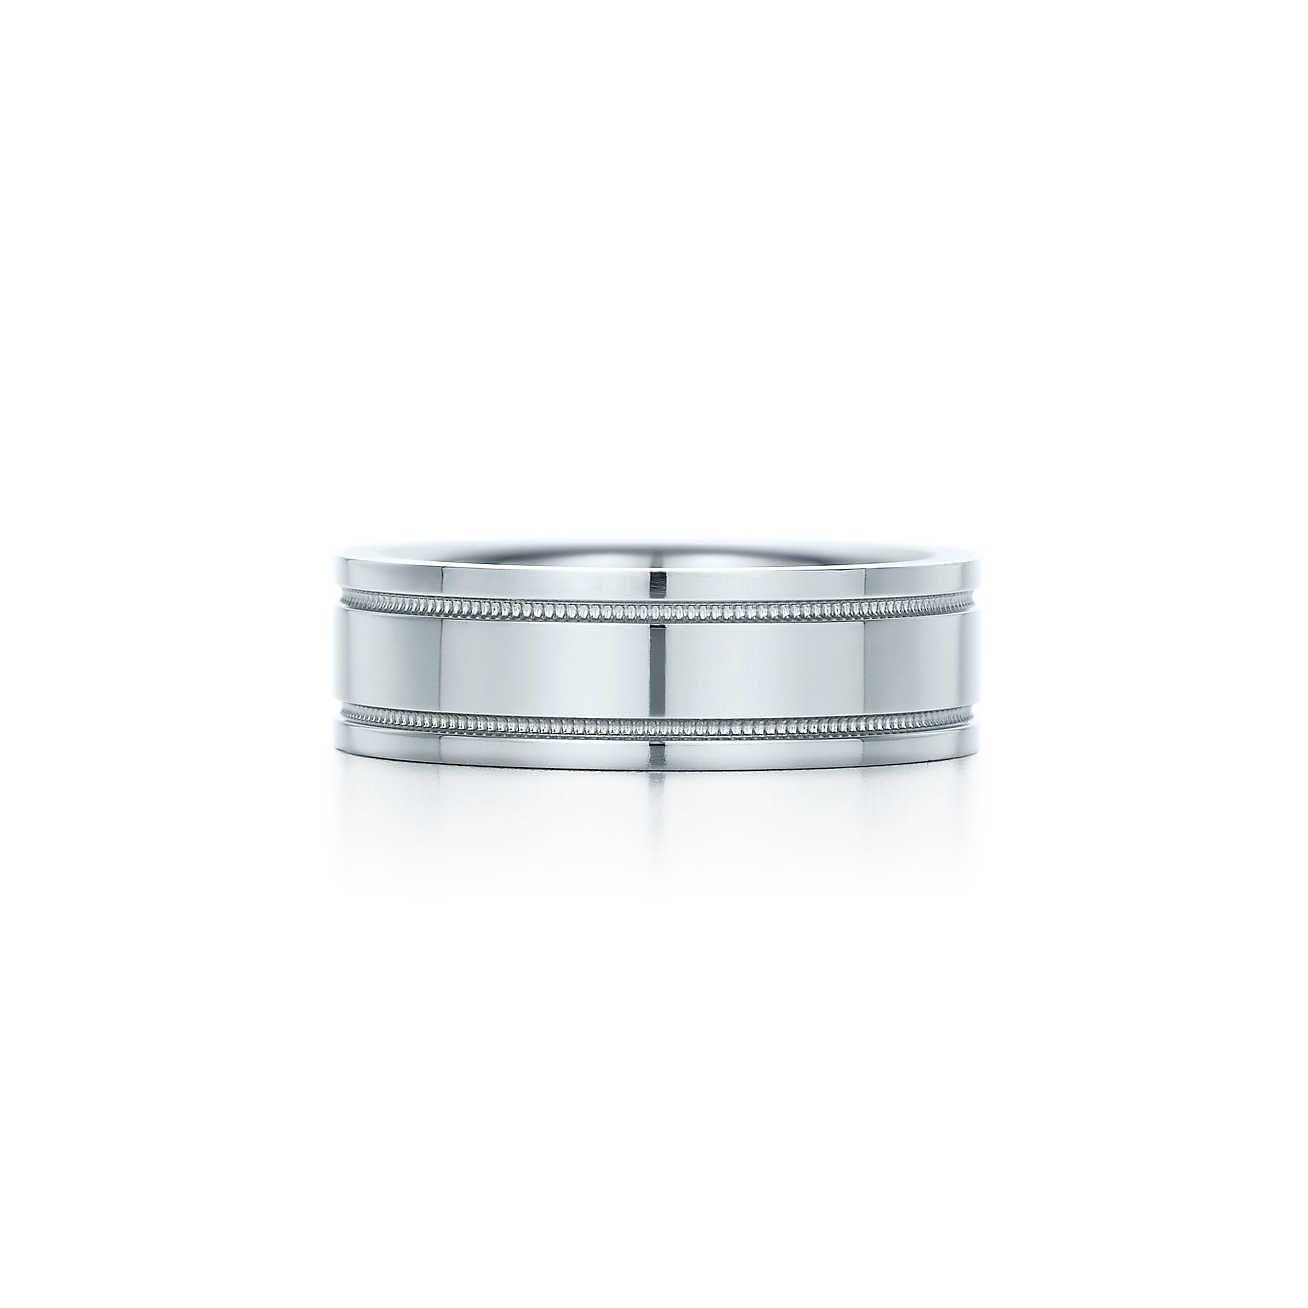 Tiffany Co Milgrain Wedding Br Band Ring Milgrain Ring Mens Wedding Bands Milgrain Wedding Bands